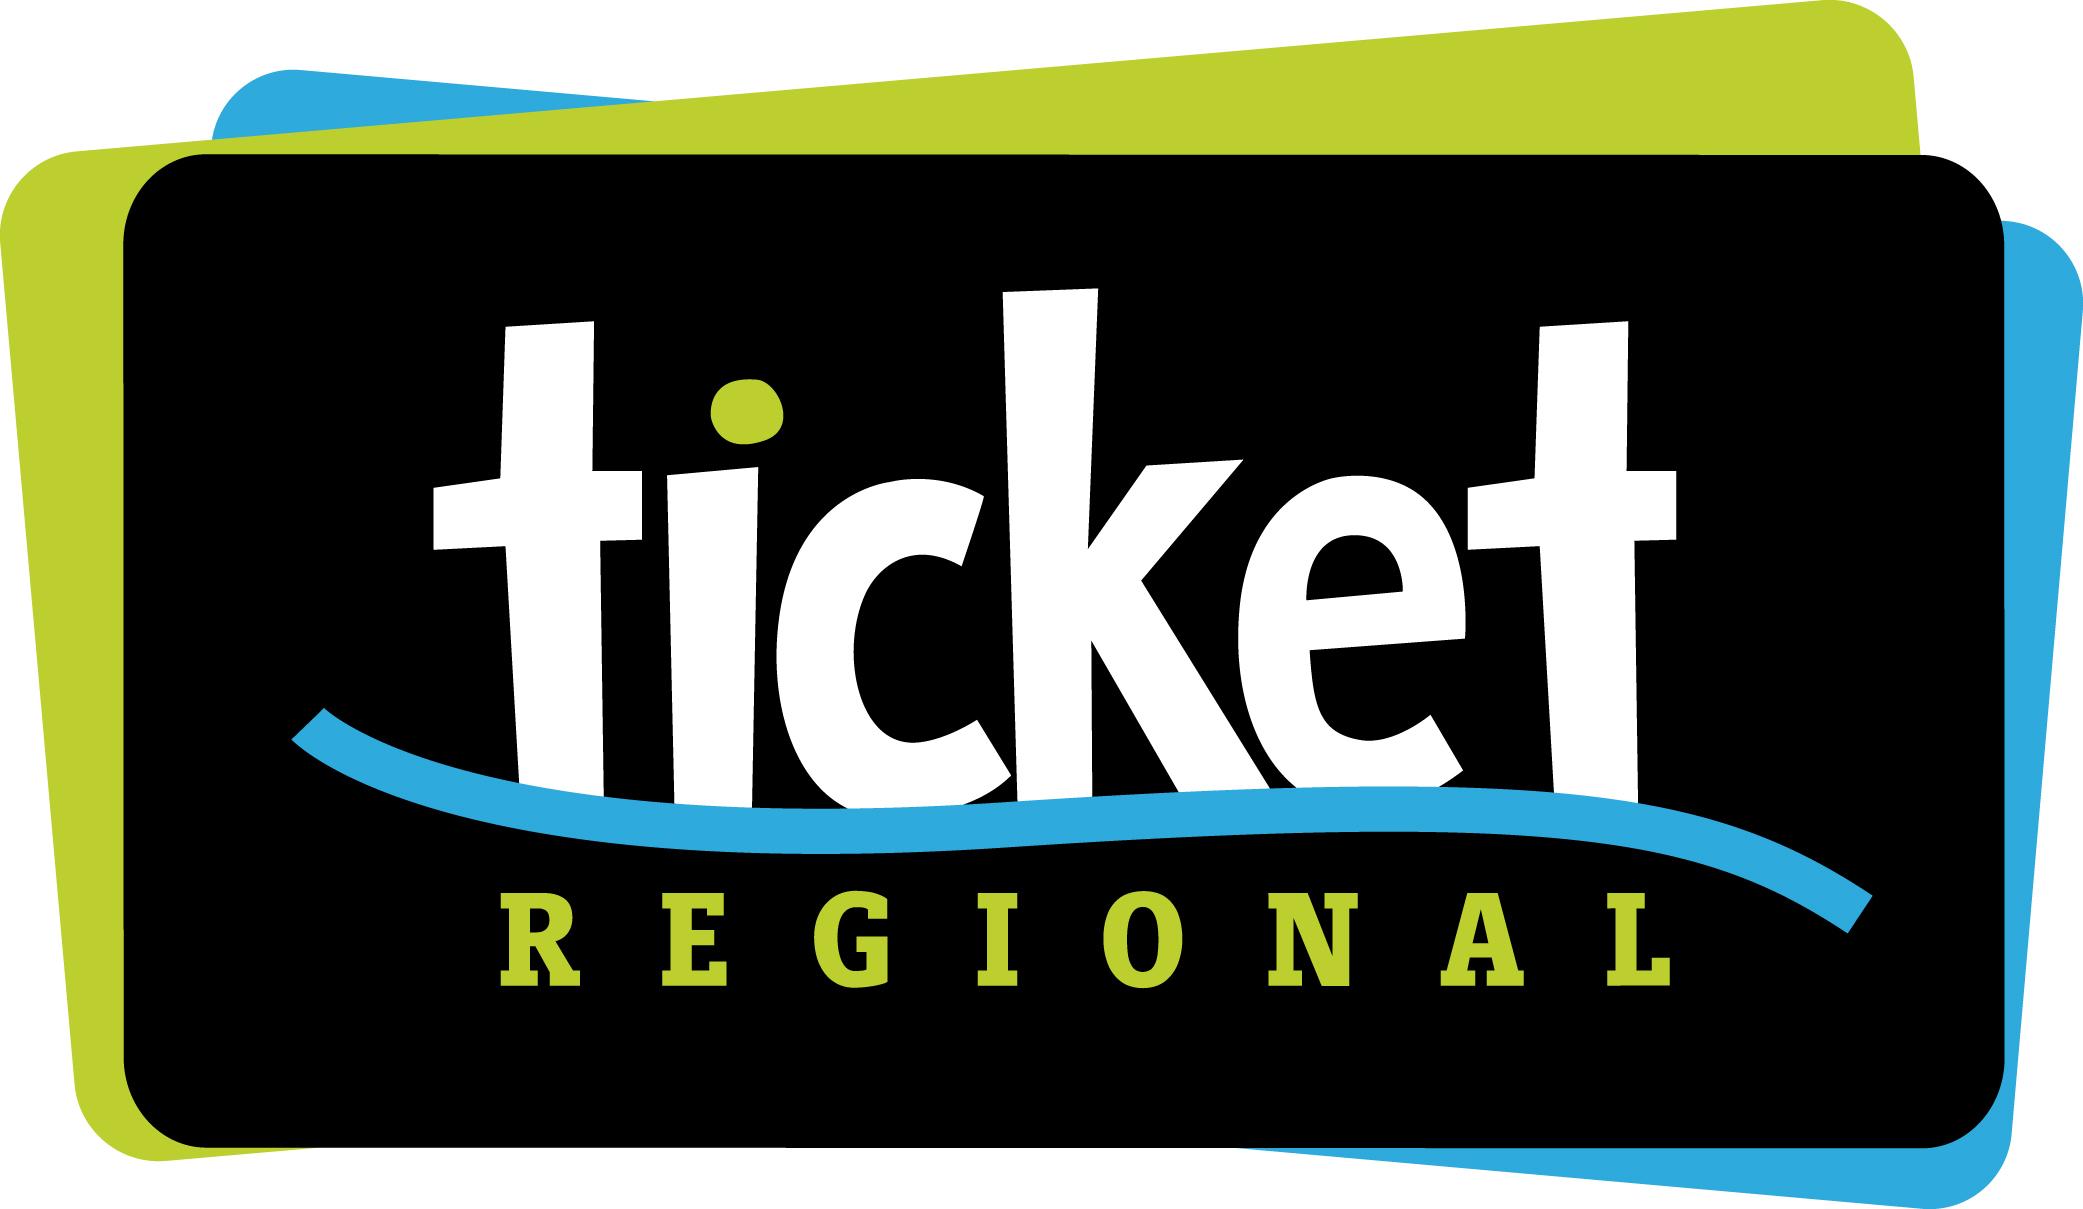 Ticket Regional